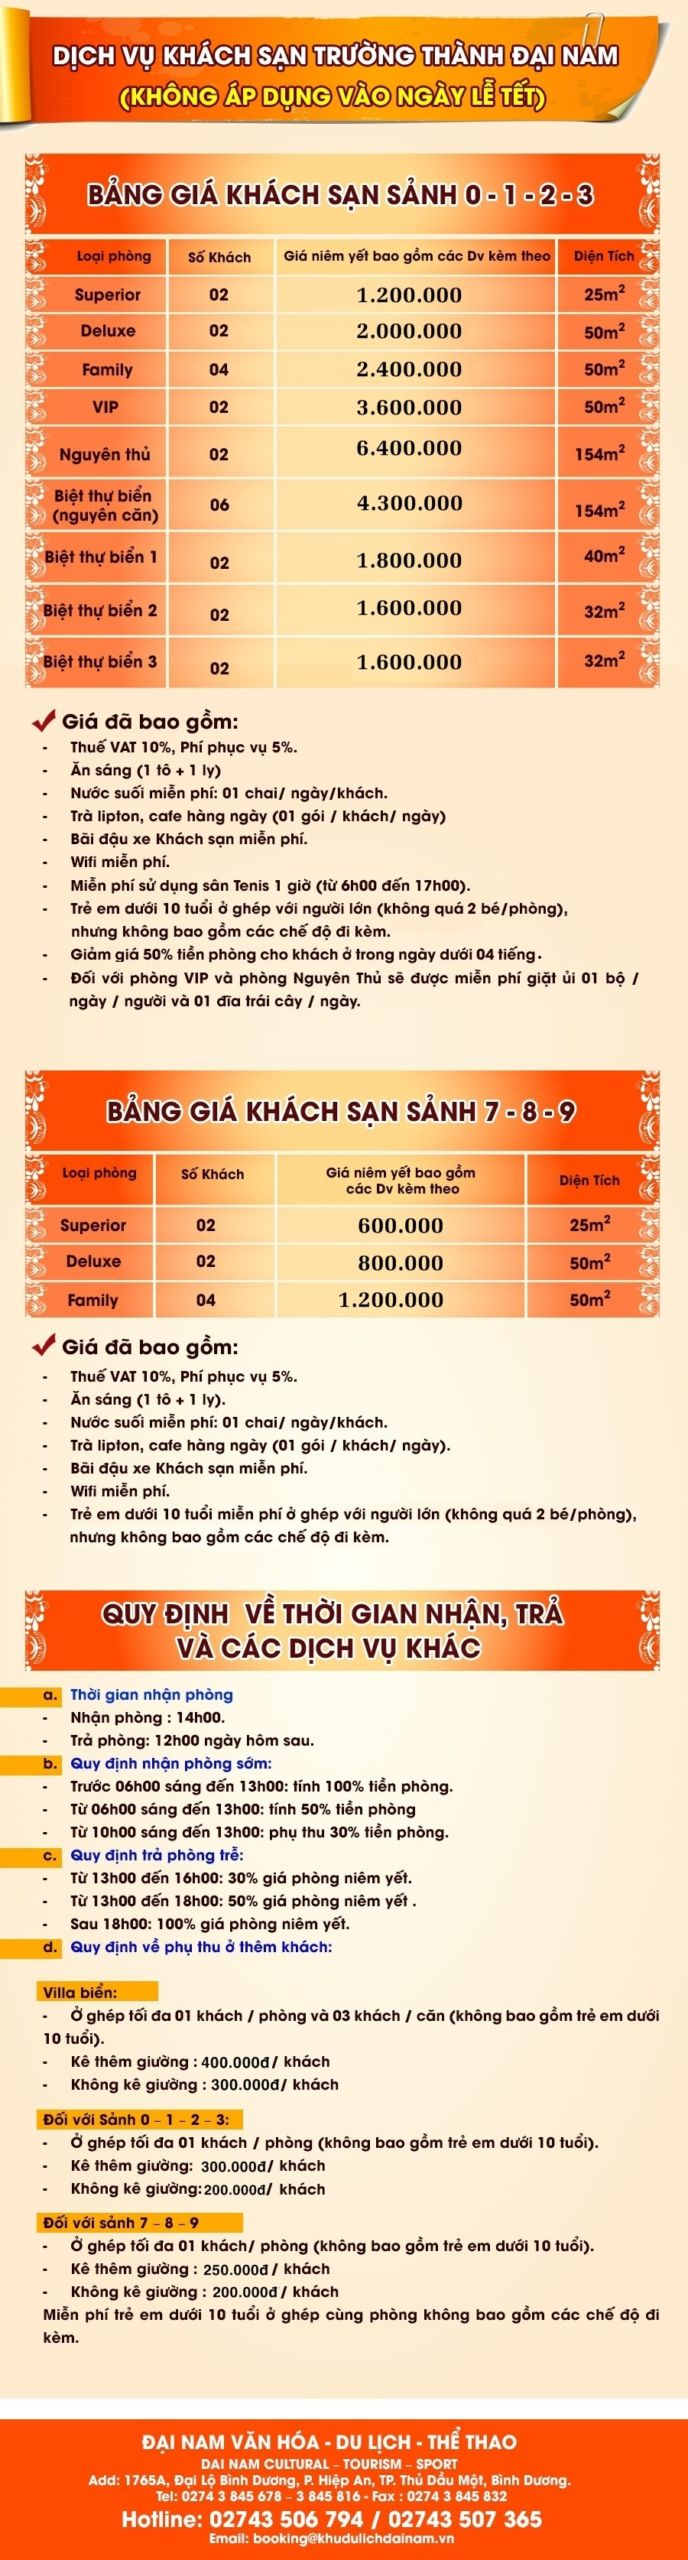 BANG_GIA_KHACH_SAN_TU_12_07